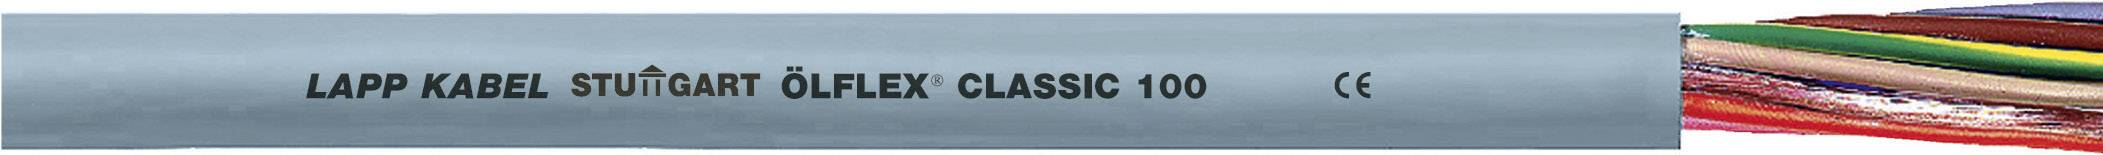 Kabel LappKabel Ölflex CLASSIC 100 4G4 (00101013), PVC, 12,5 mm, 750 V, šedá, 50 m